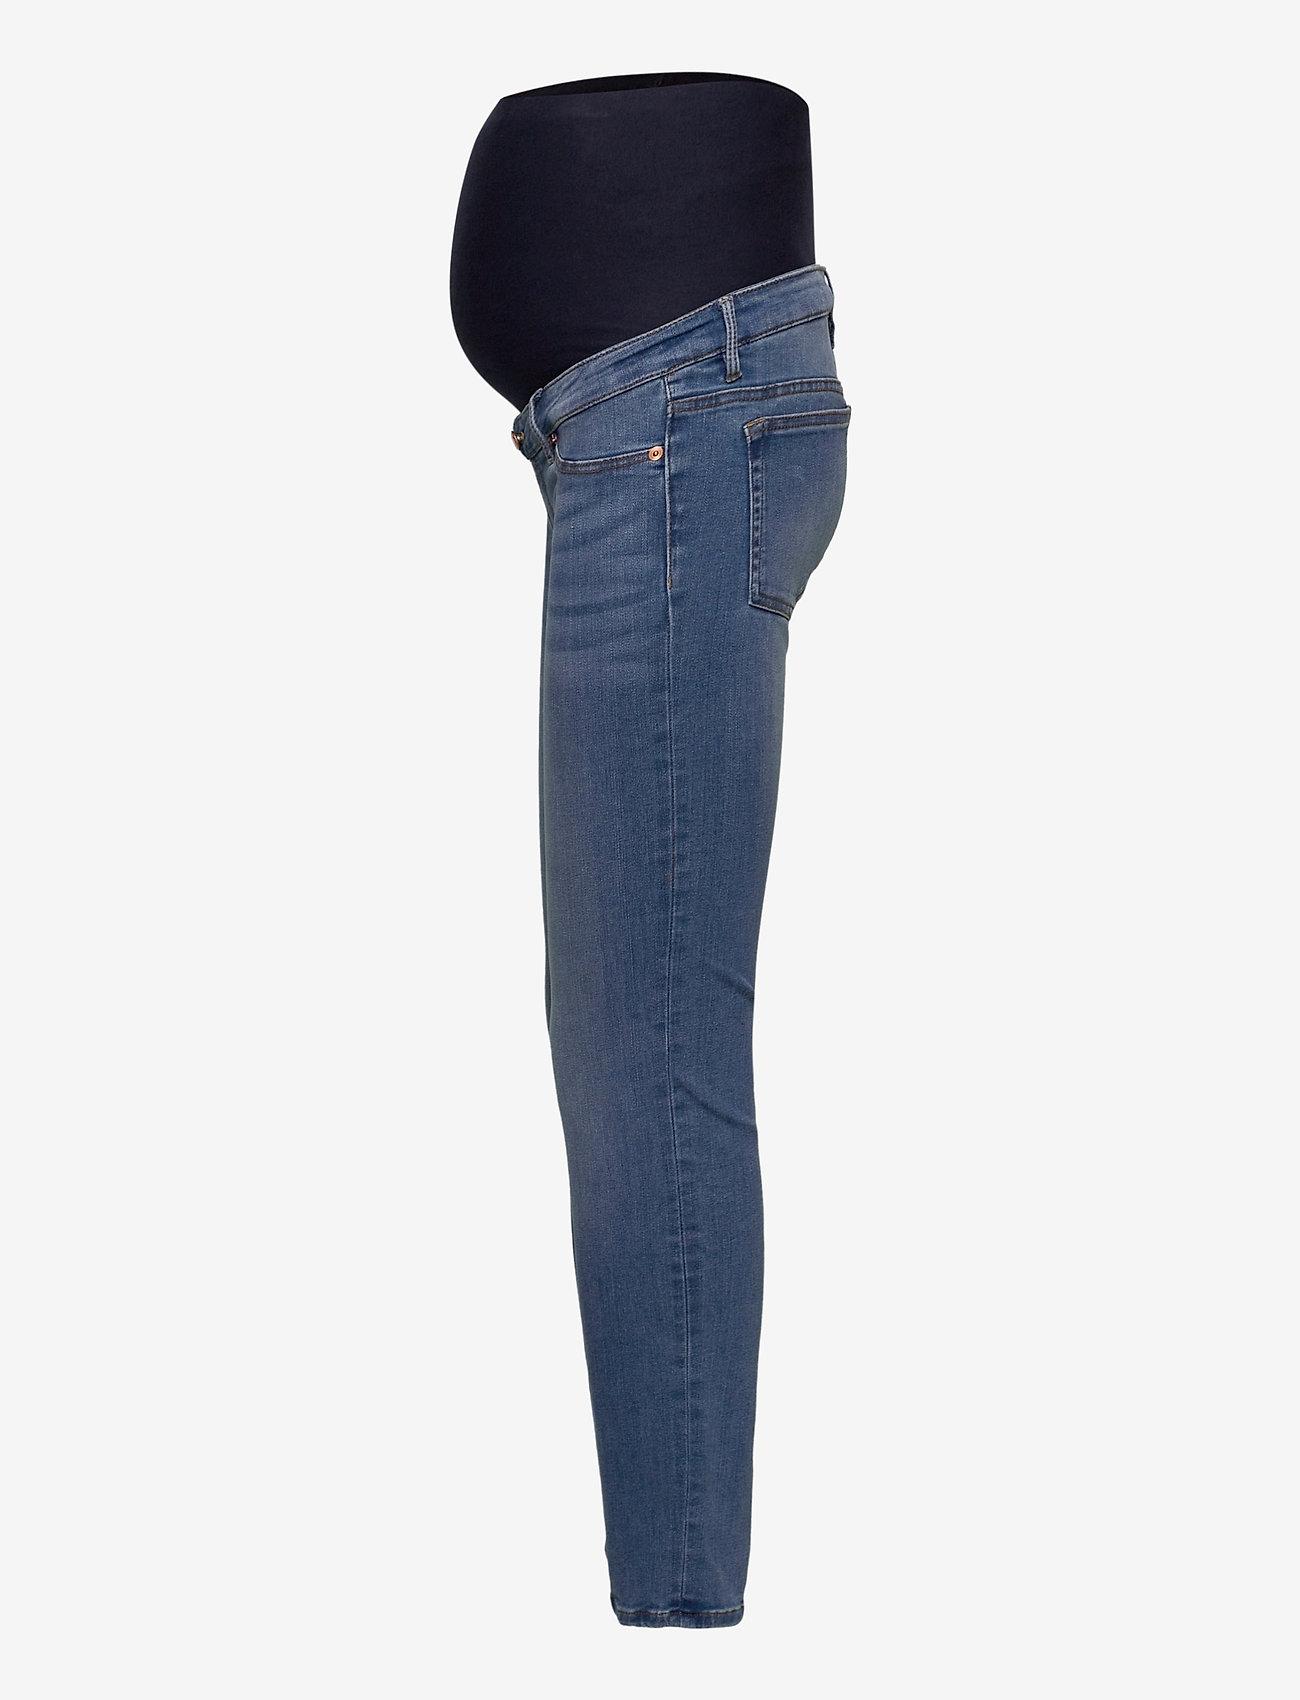 Trousers Denim Mom Clara Blue (Blue) (45.49 €) - Lindex VQZIe